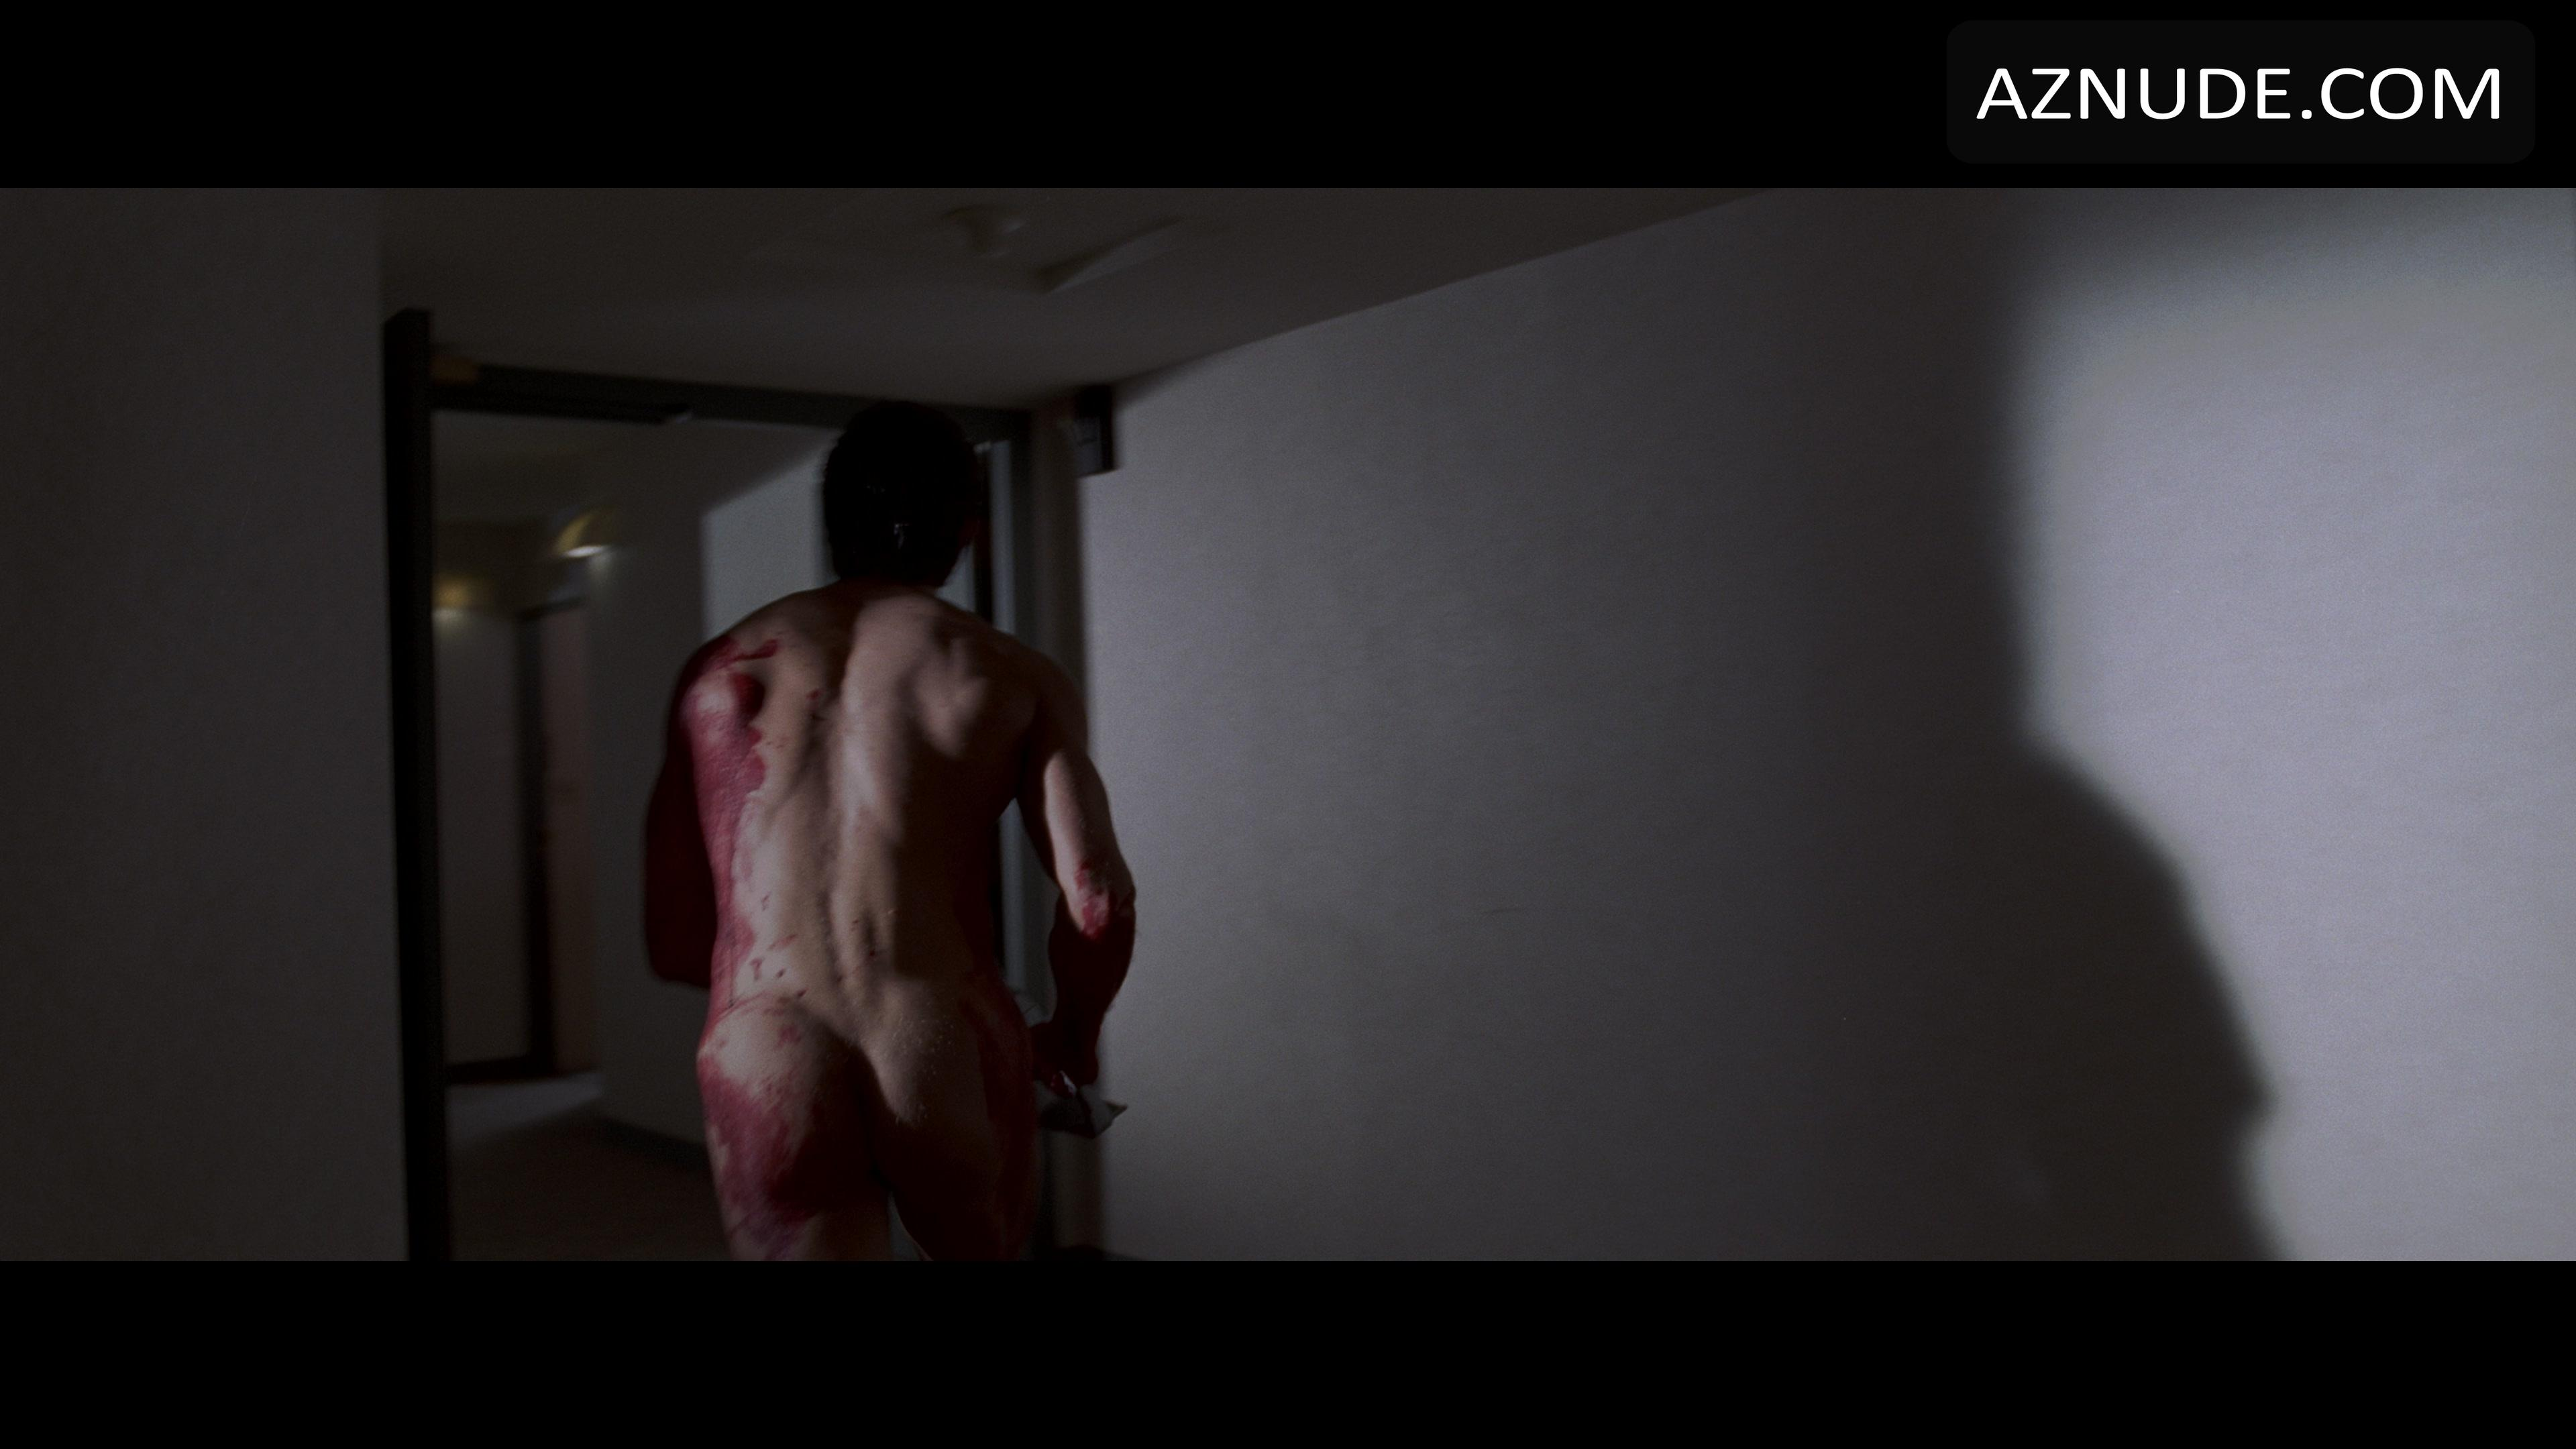 Christian bale nude photos